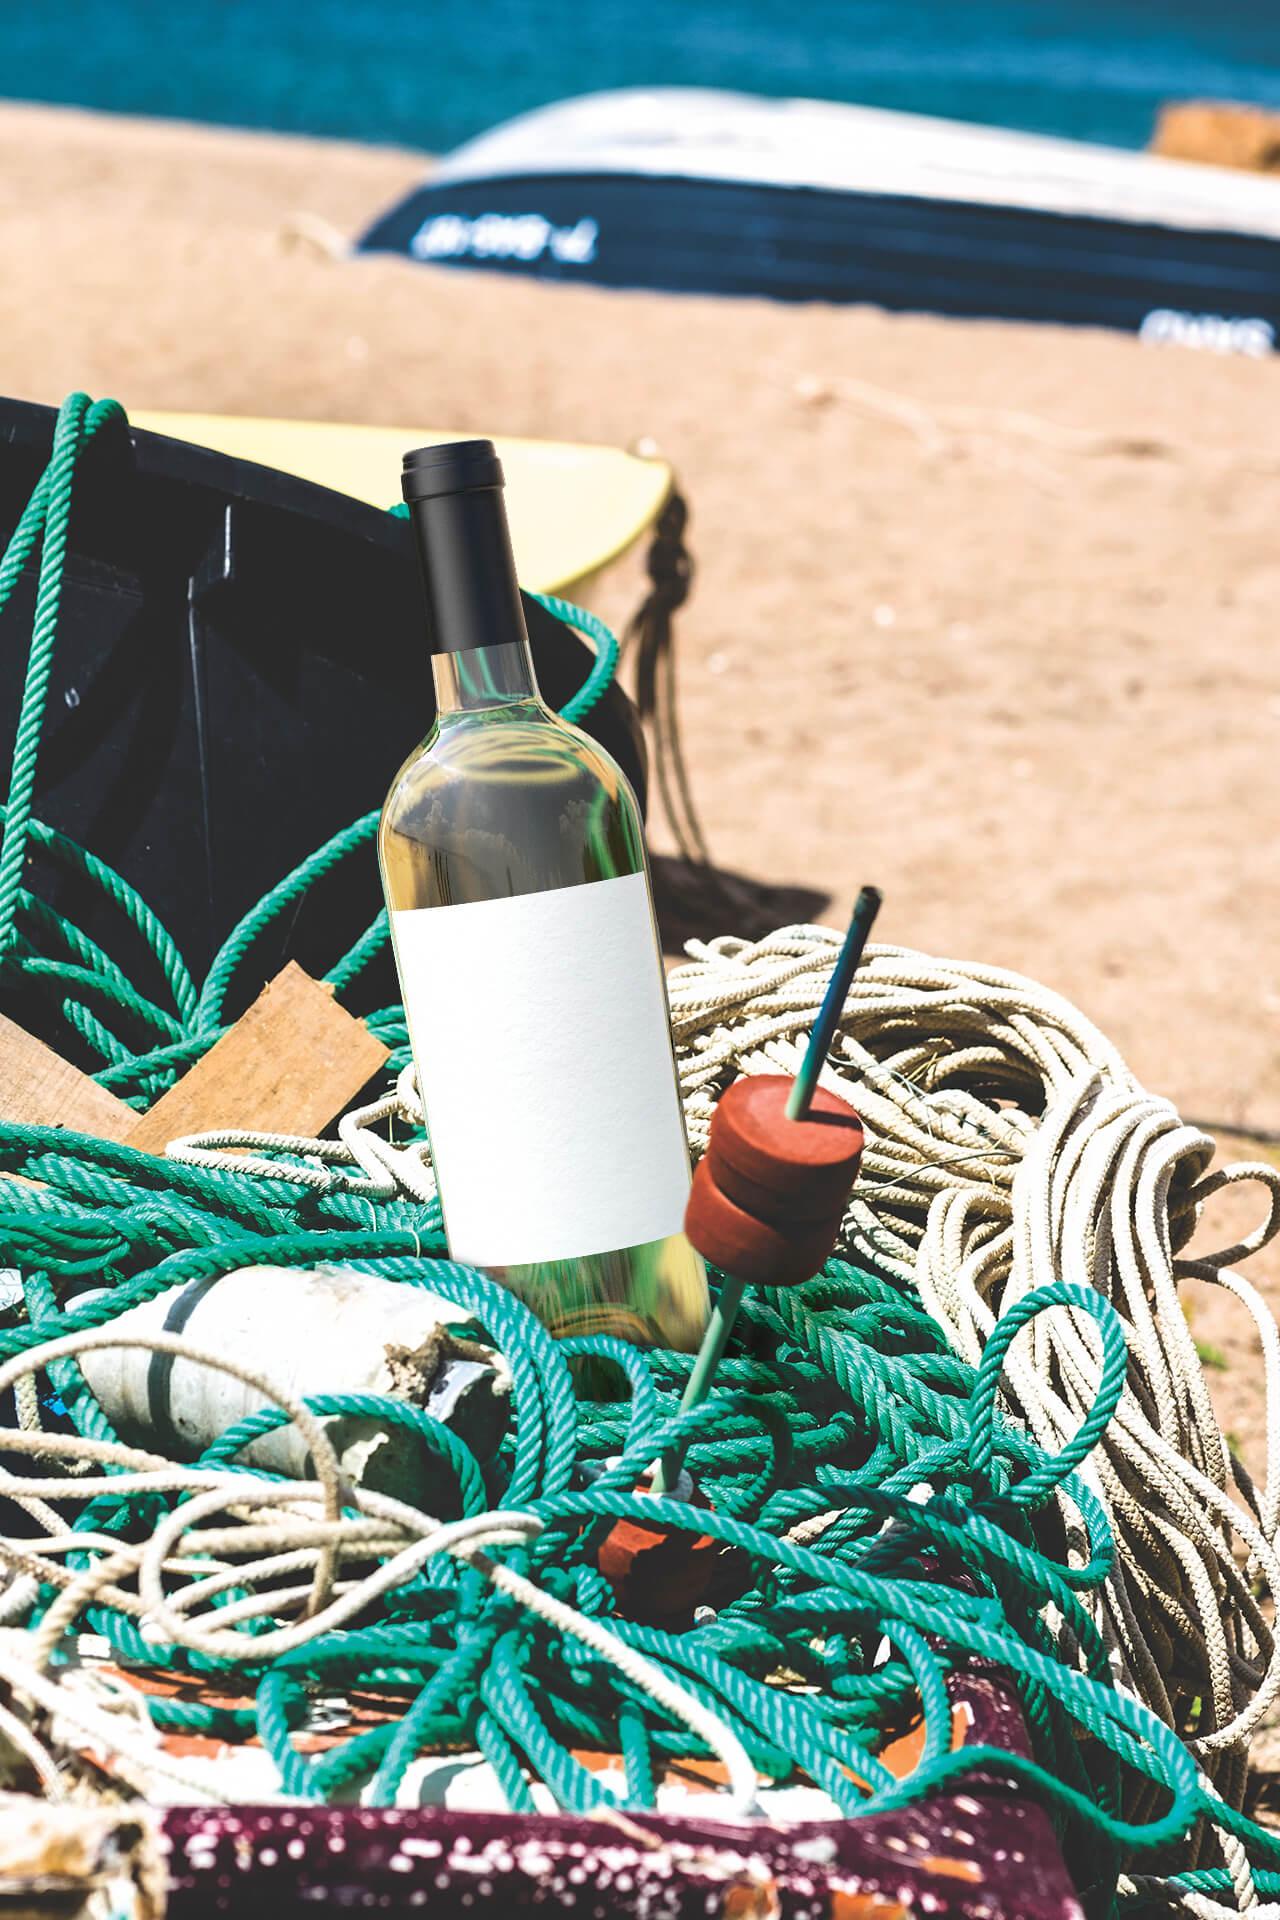 Fisherman ropes